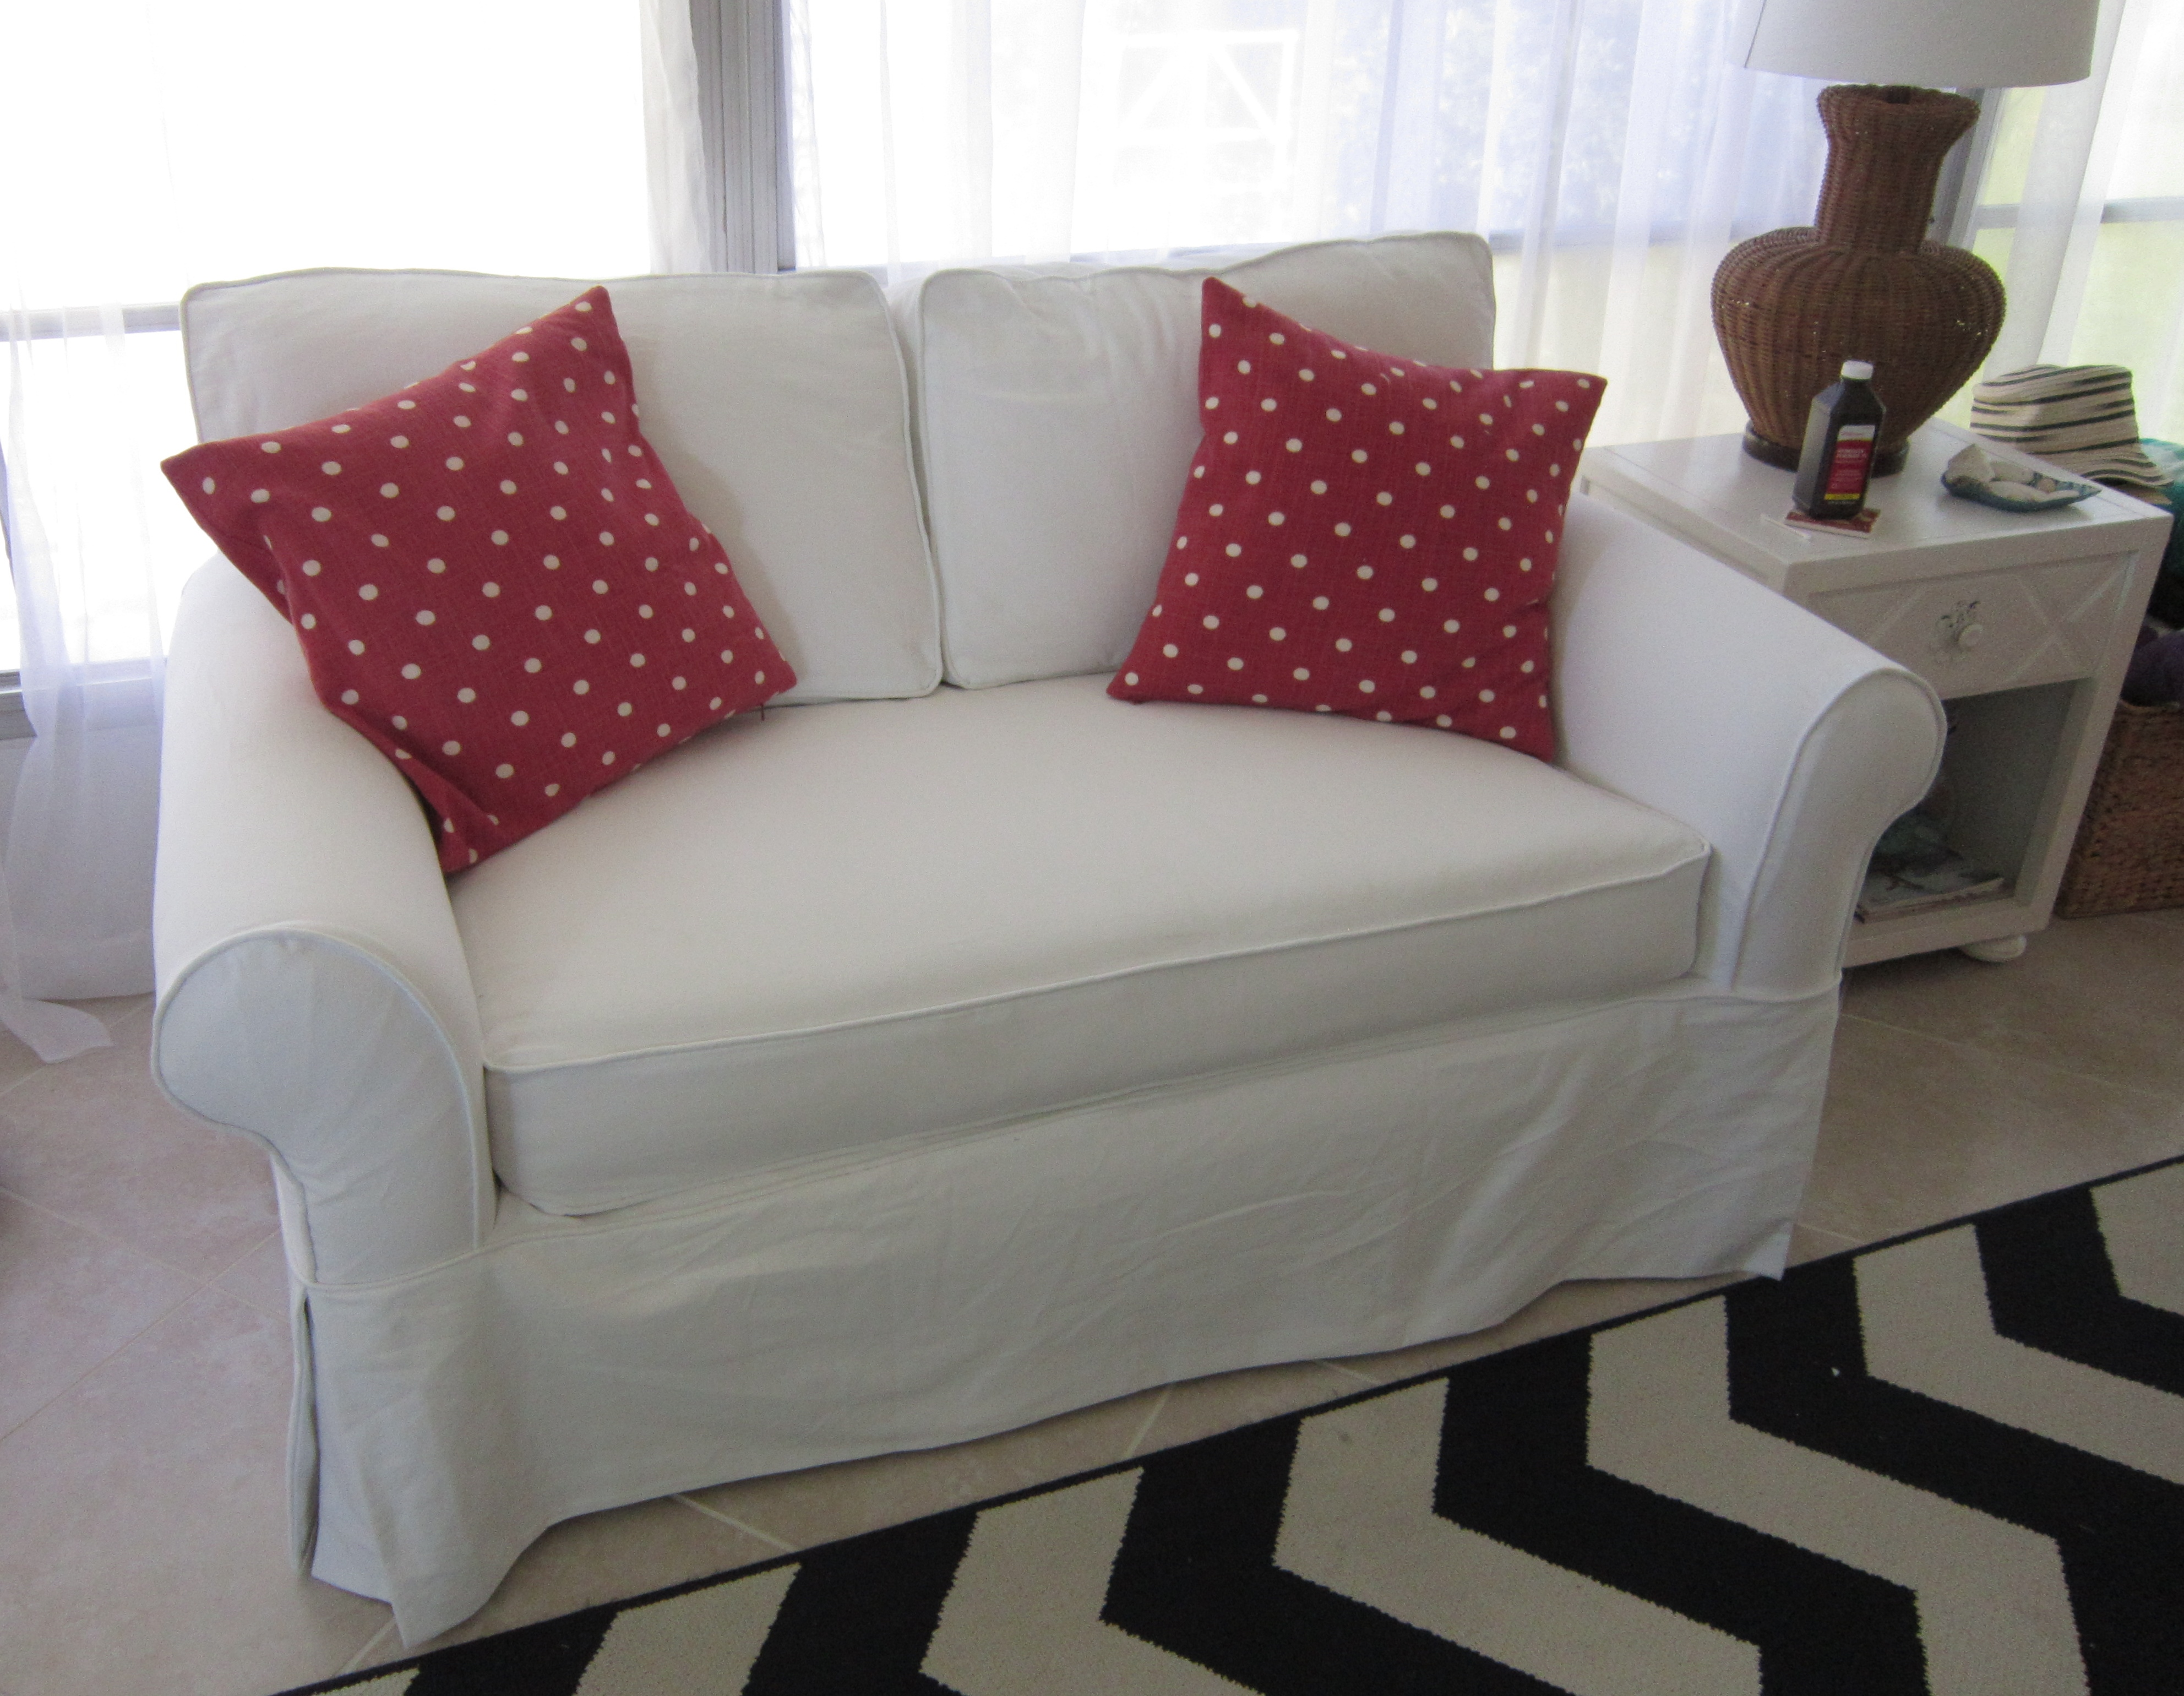 Fabric 8 Slipcovers Lehigh Acres Fl Www